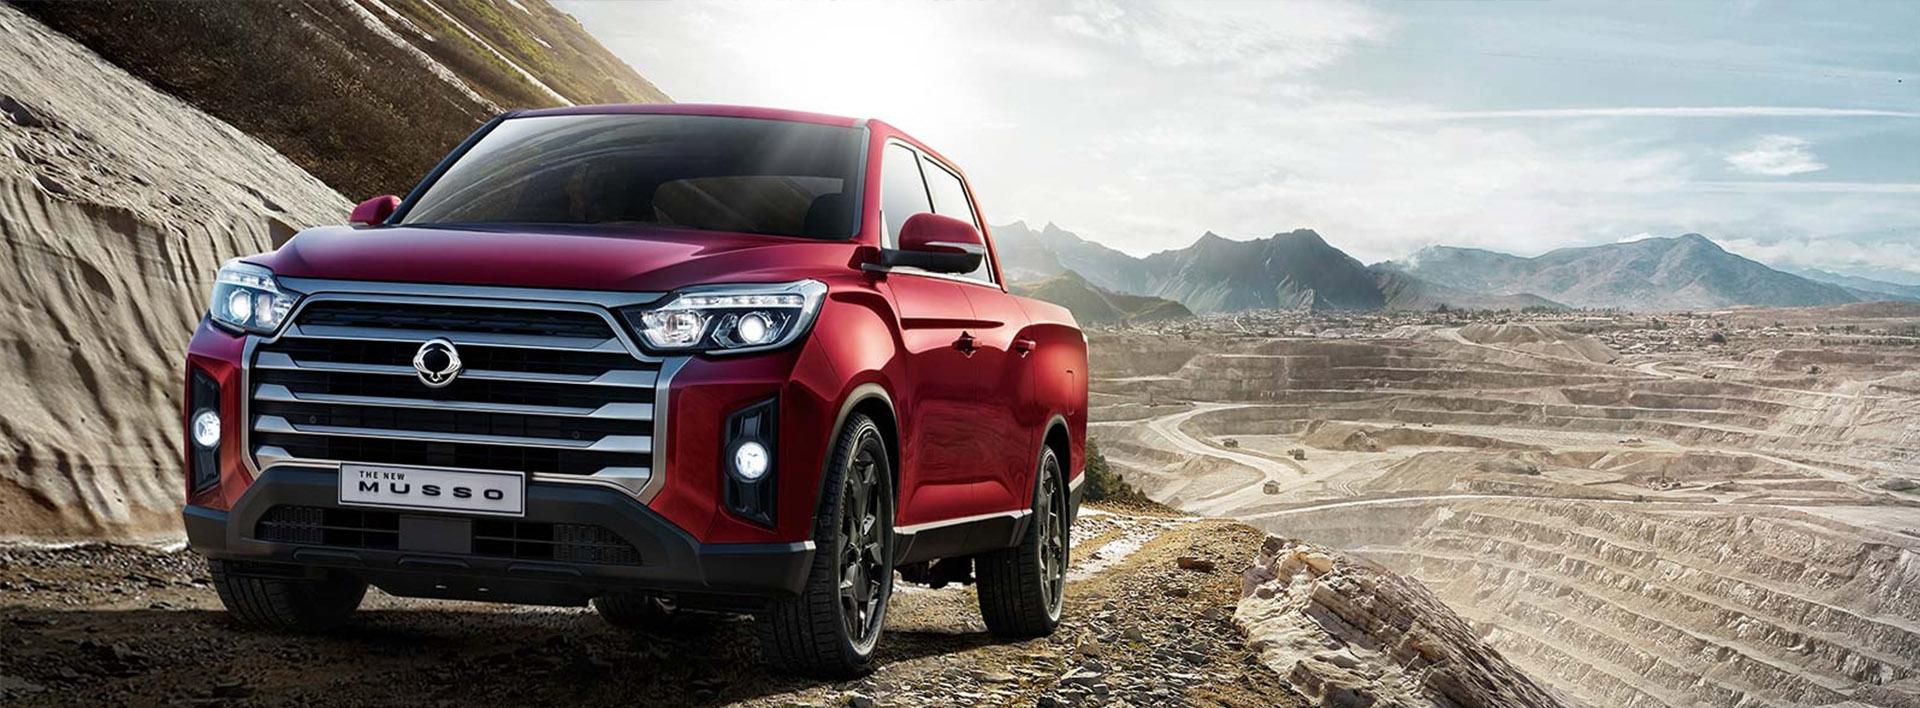 SsangYong New Cars Range